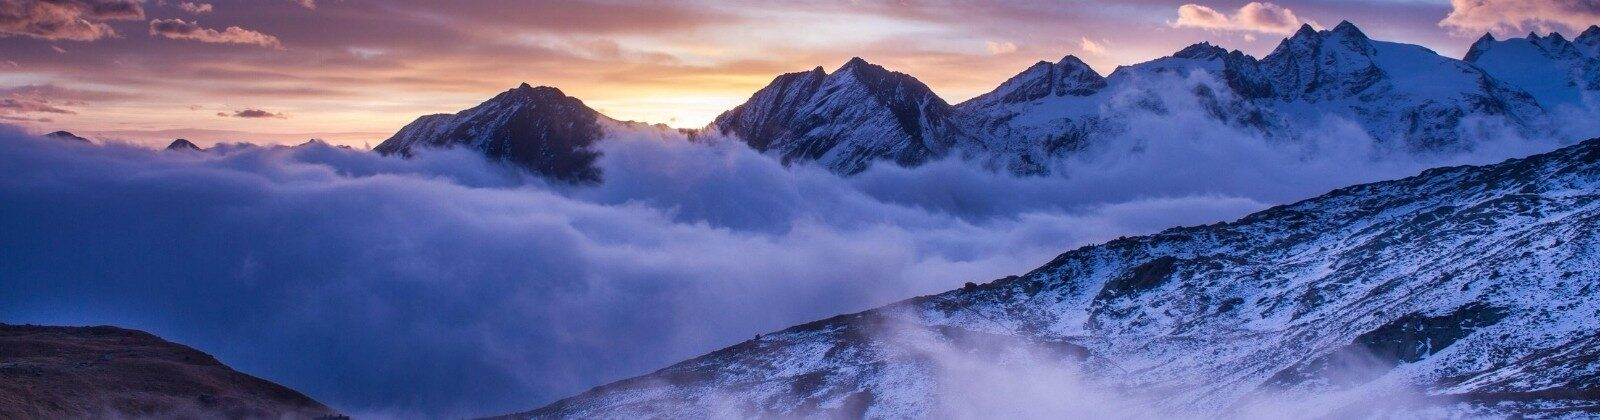 italian alps europe